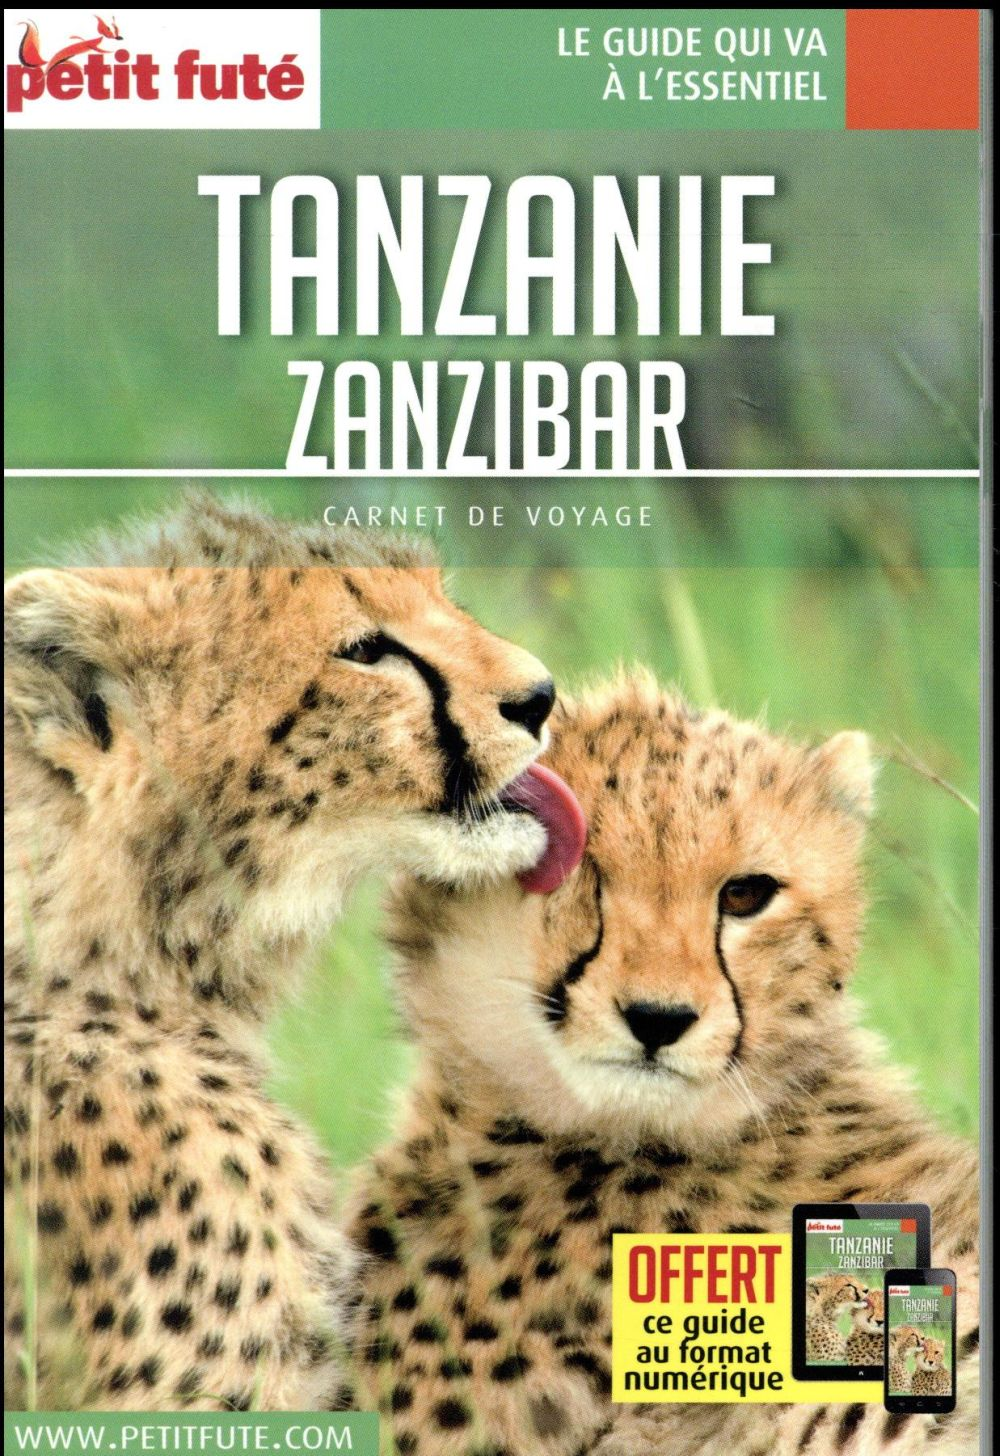 GUIDE PETIT FUTE ; CARNETS DE VOYAGE ; Tanzanie, Zanzibar (édition 2018/2019)